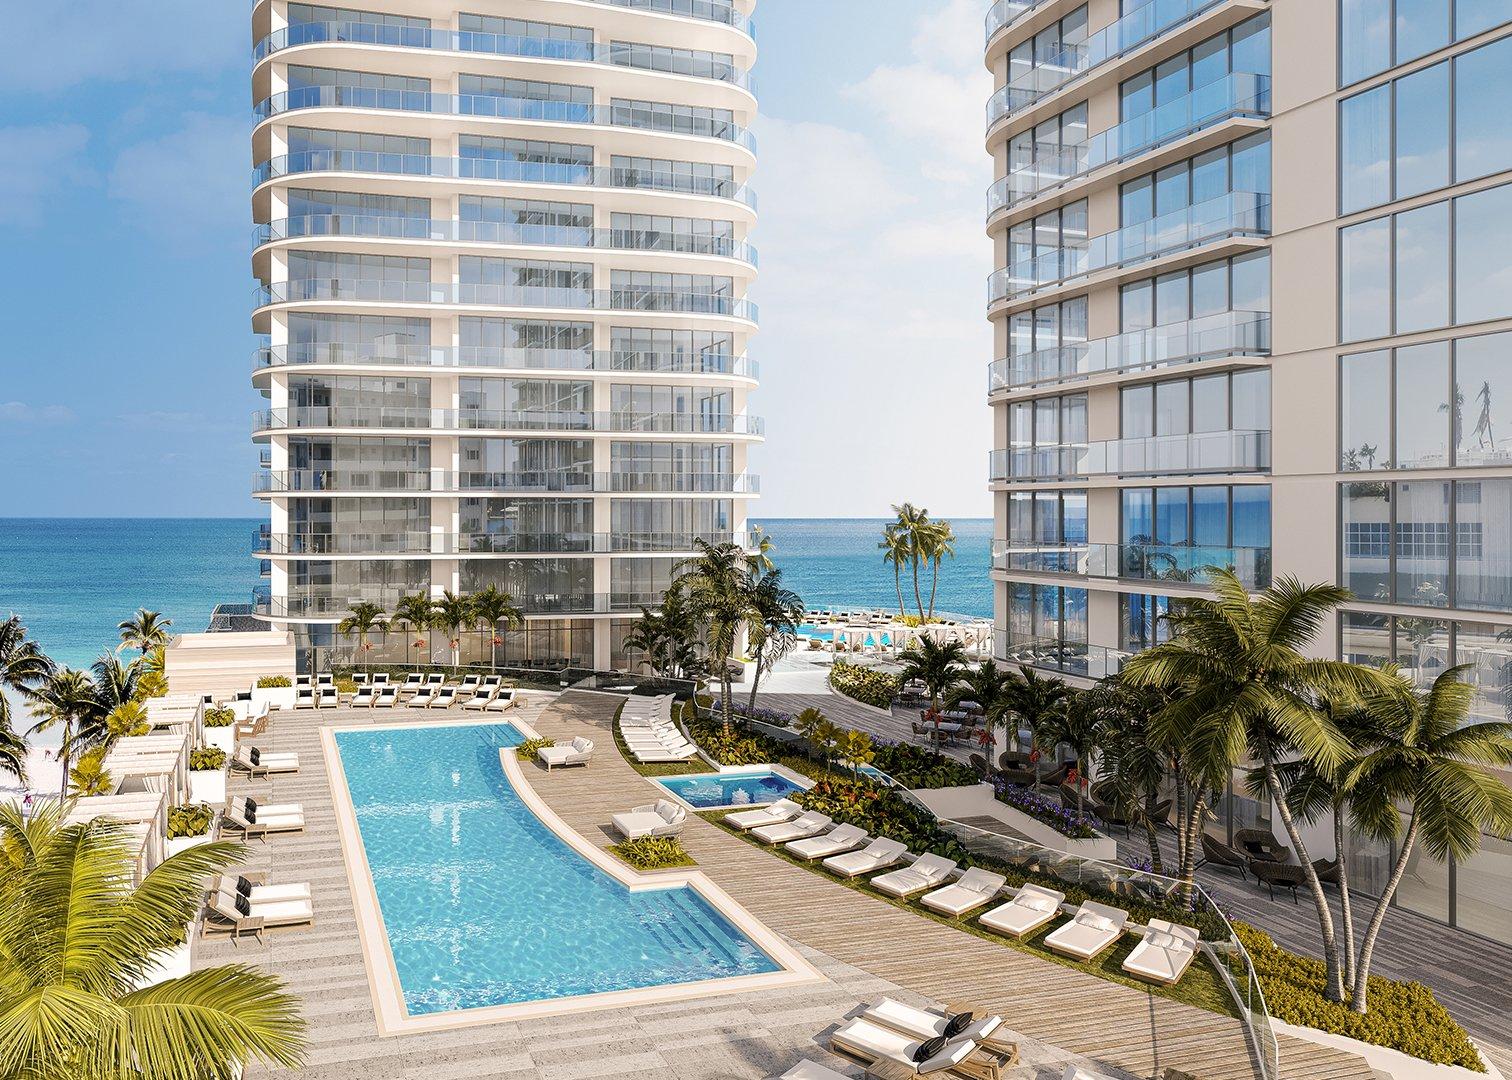 Oceanfront Condo Fort Lauderdale